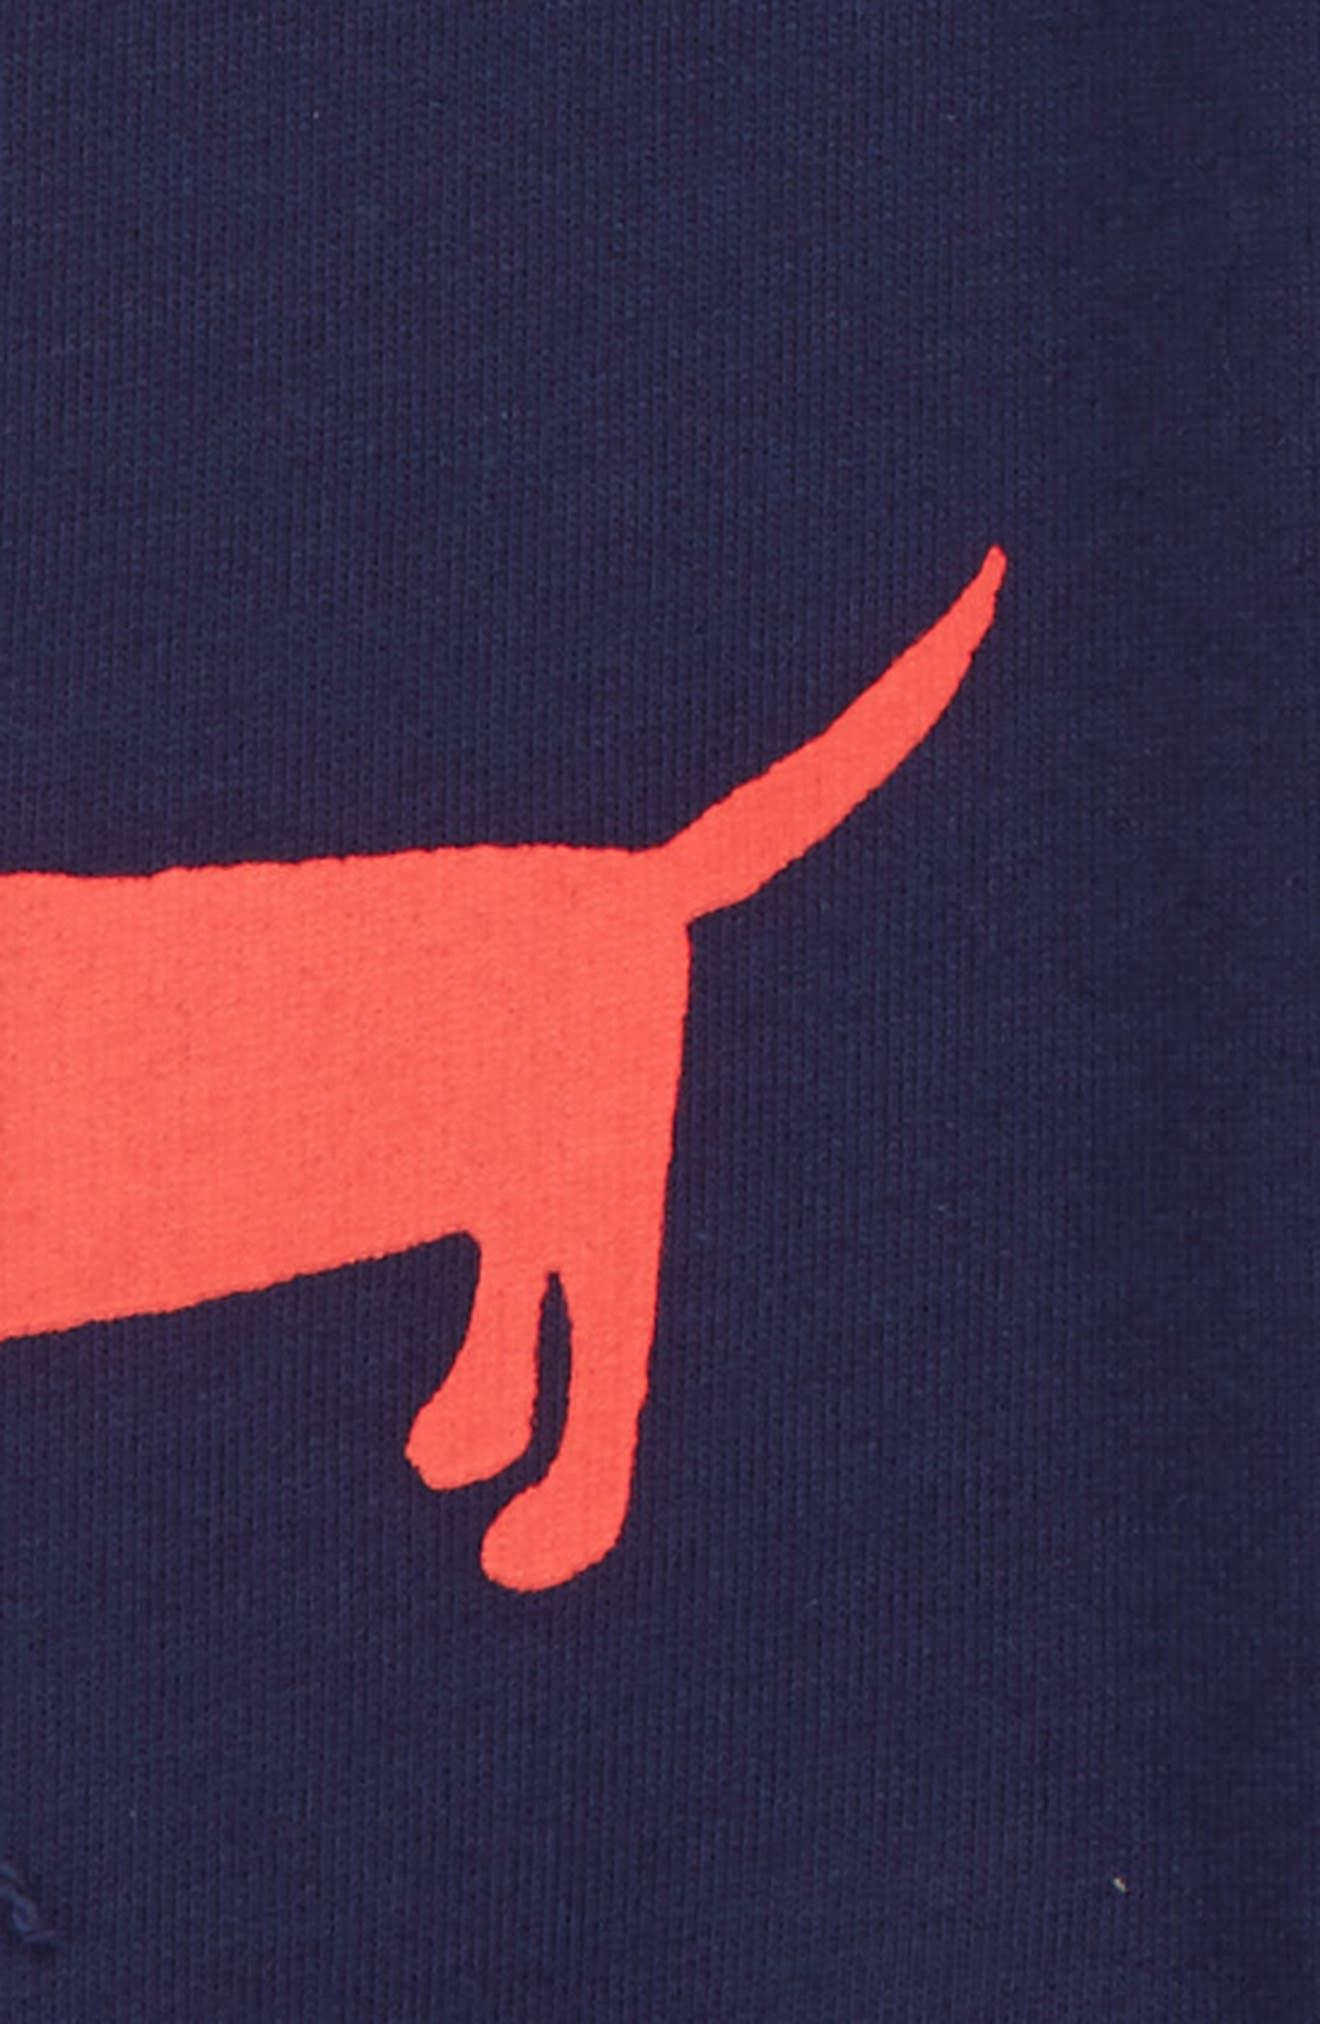 Dog Sweatpants,                             Alternate thumbnail 3, color,                             Navy